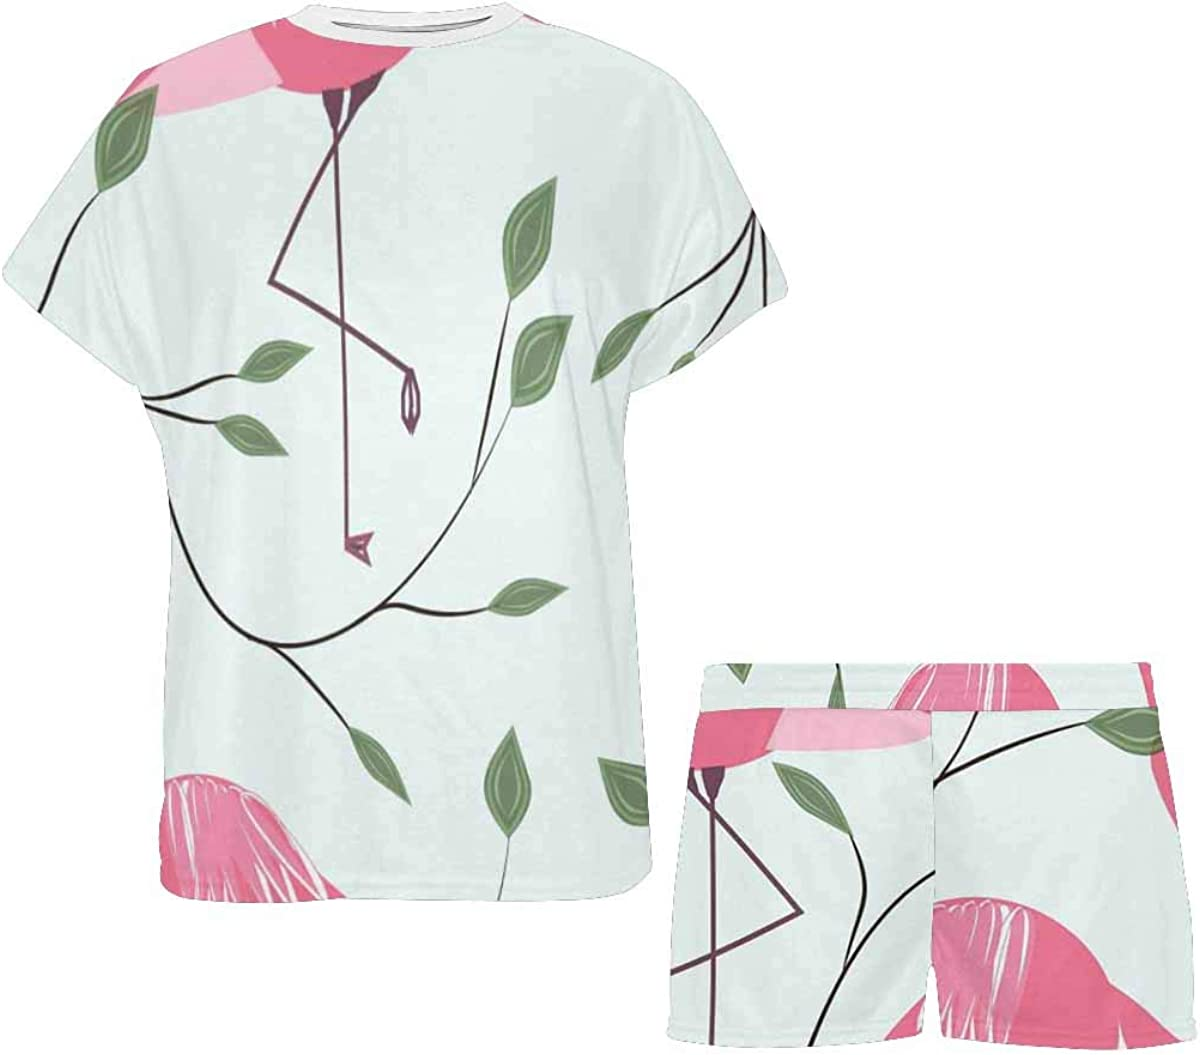 INTERESTPRINT Flamingos Leaves Women's Breathable 2 Piece Shorts Pajama Sleepwear Set